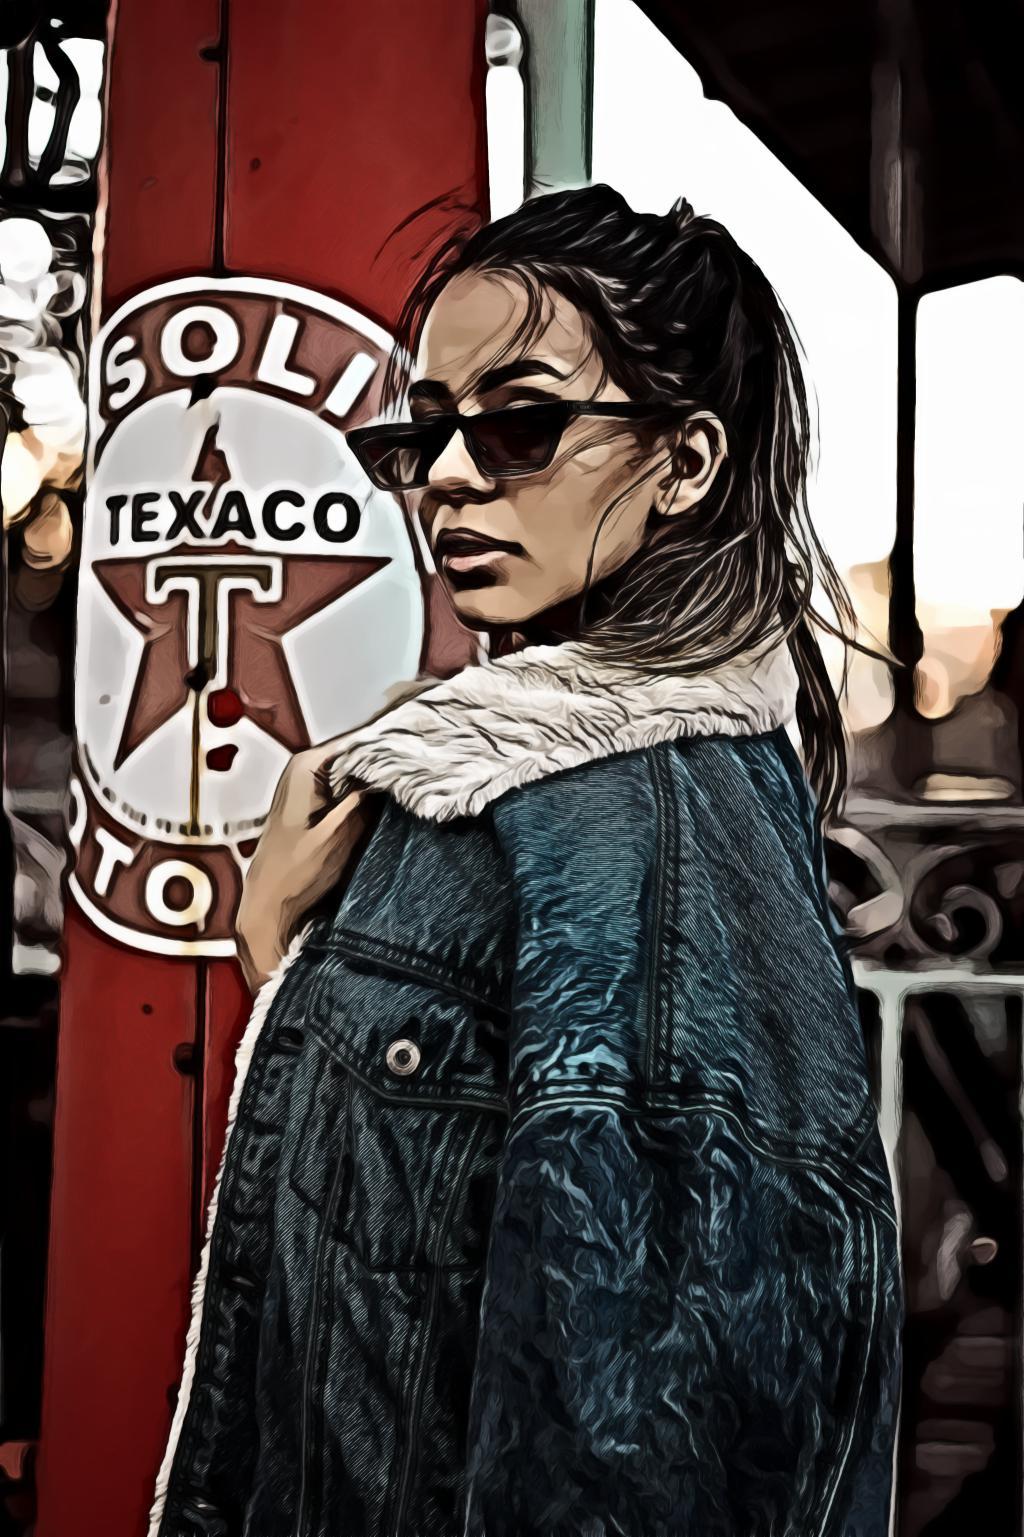 Woman Wearing Denim Jacket and Sunglasses